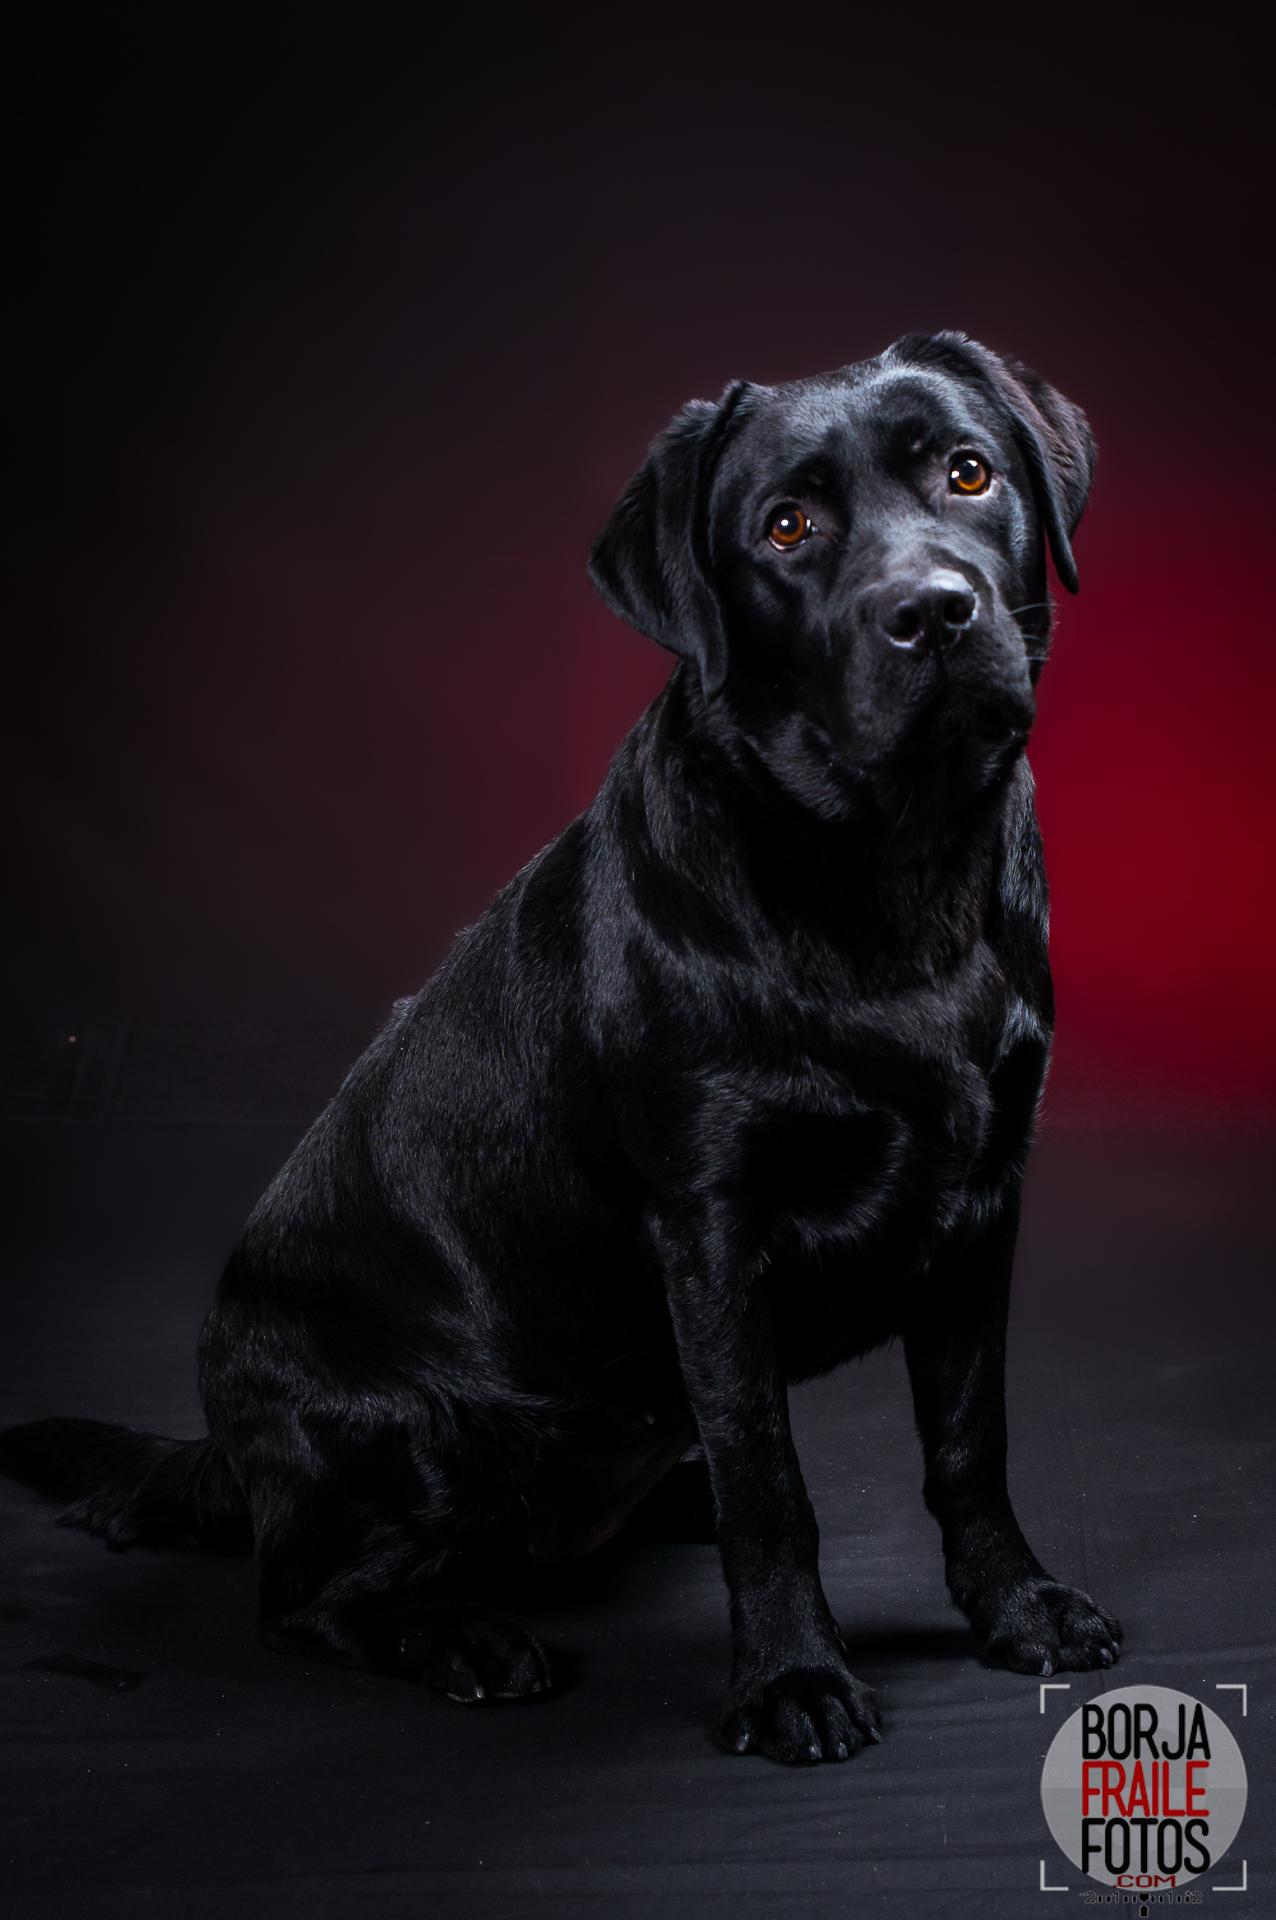 20210102panceta023ps - Panceta, perra modelo... fotos de perros.